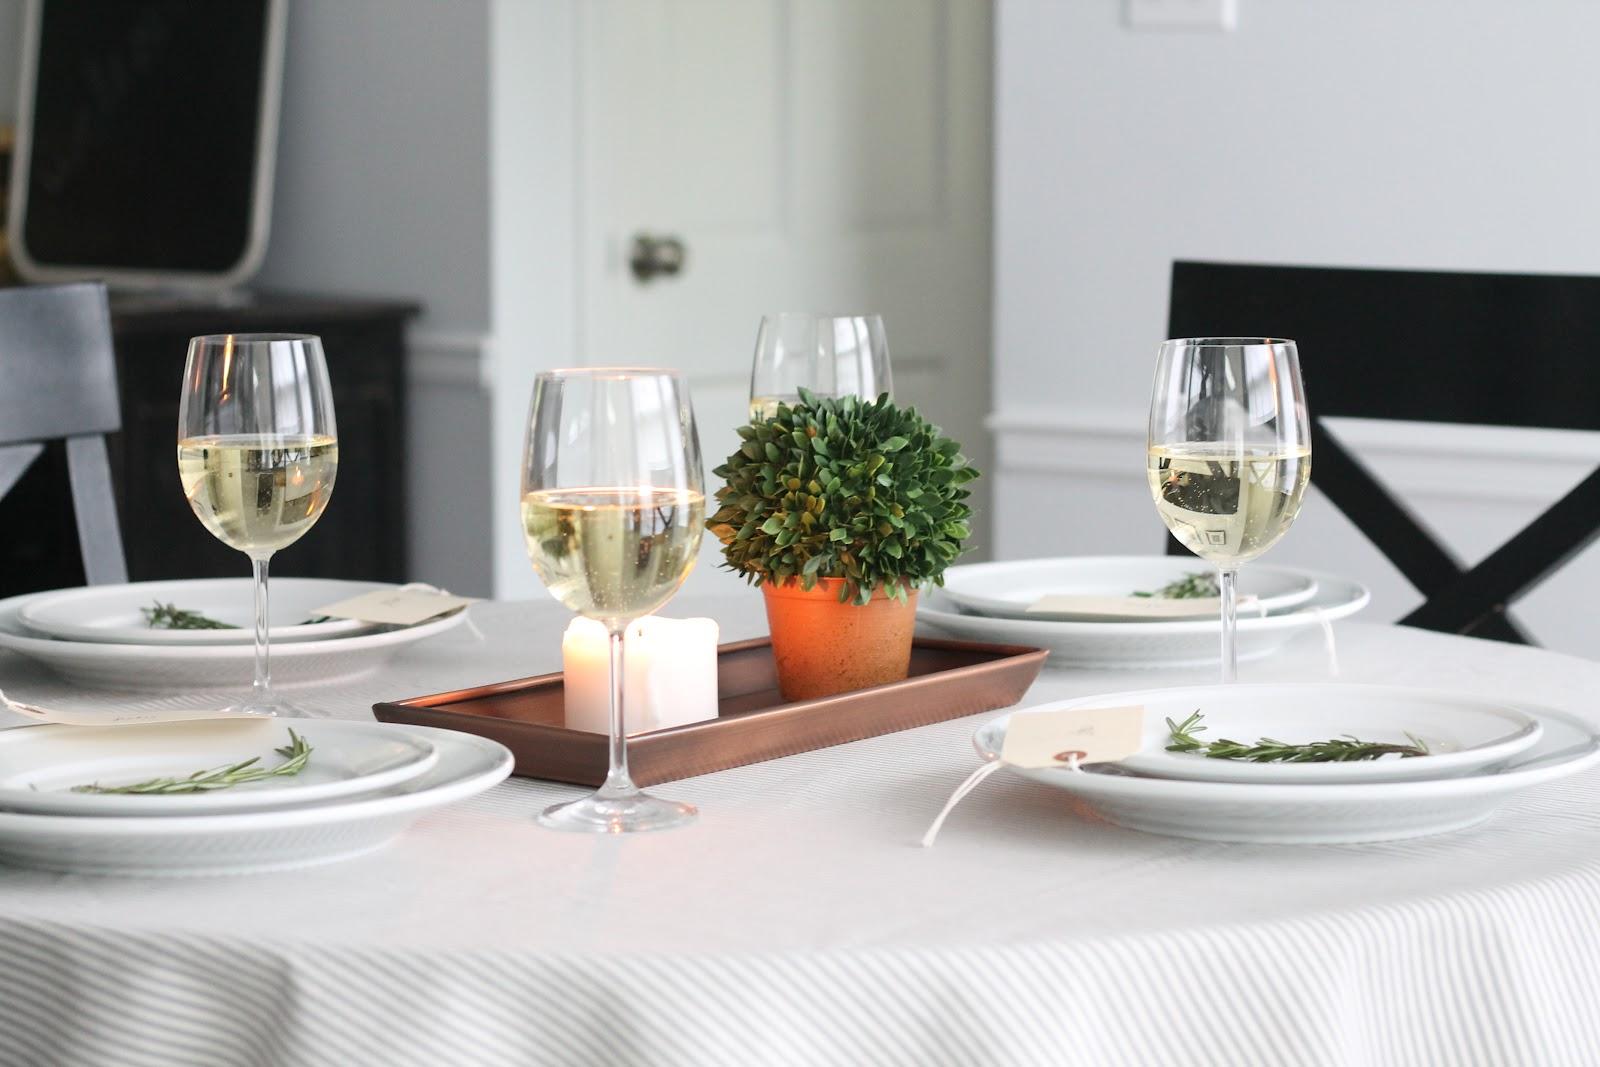 Dinner Party Ideas - Julie Blanner